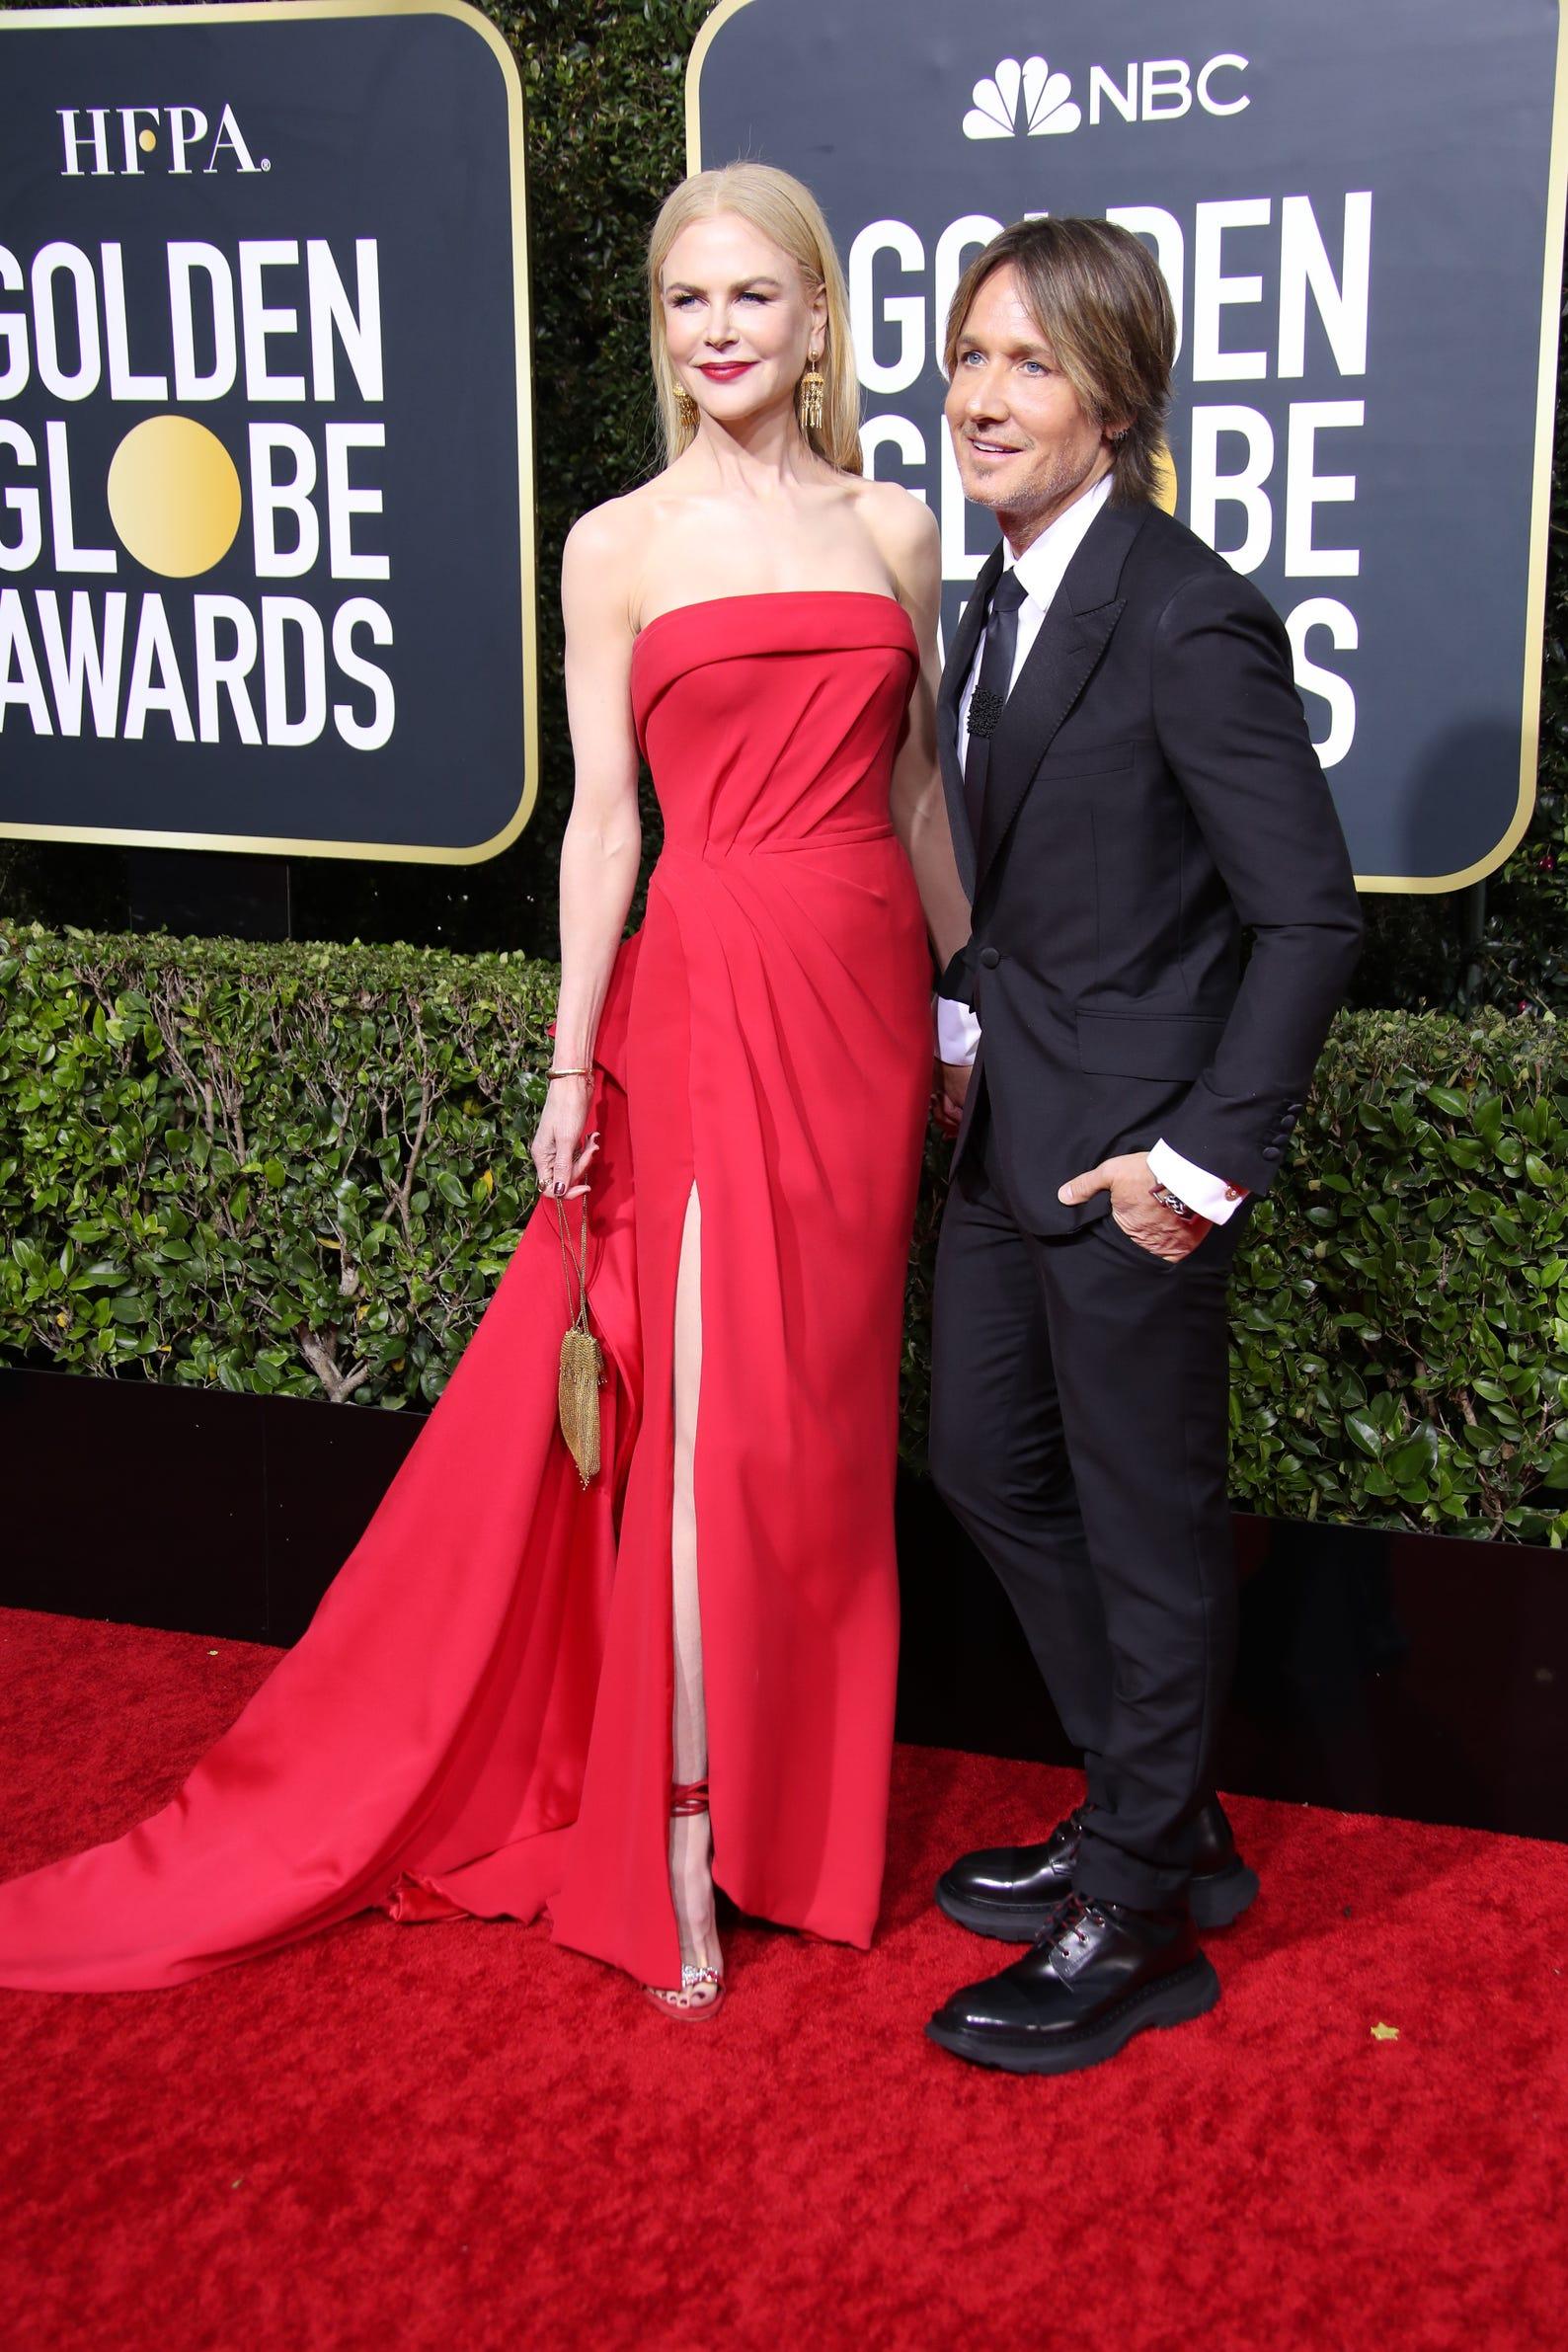 Nicole Kidman, left, and Keith Urban